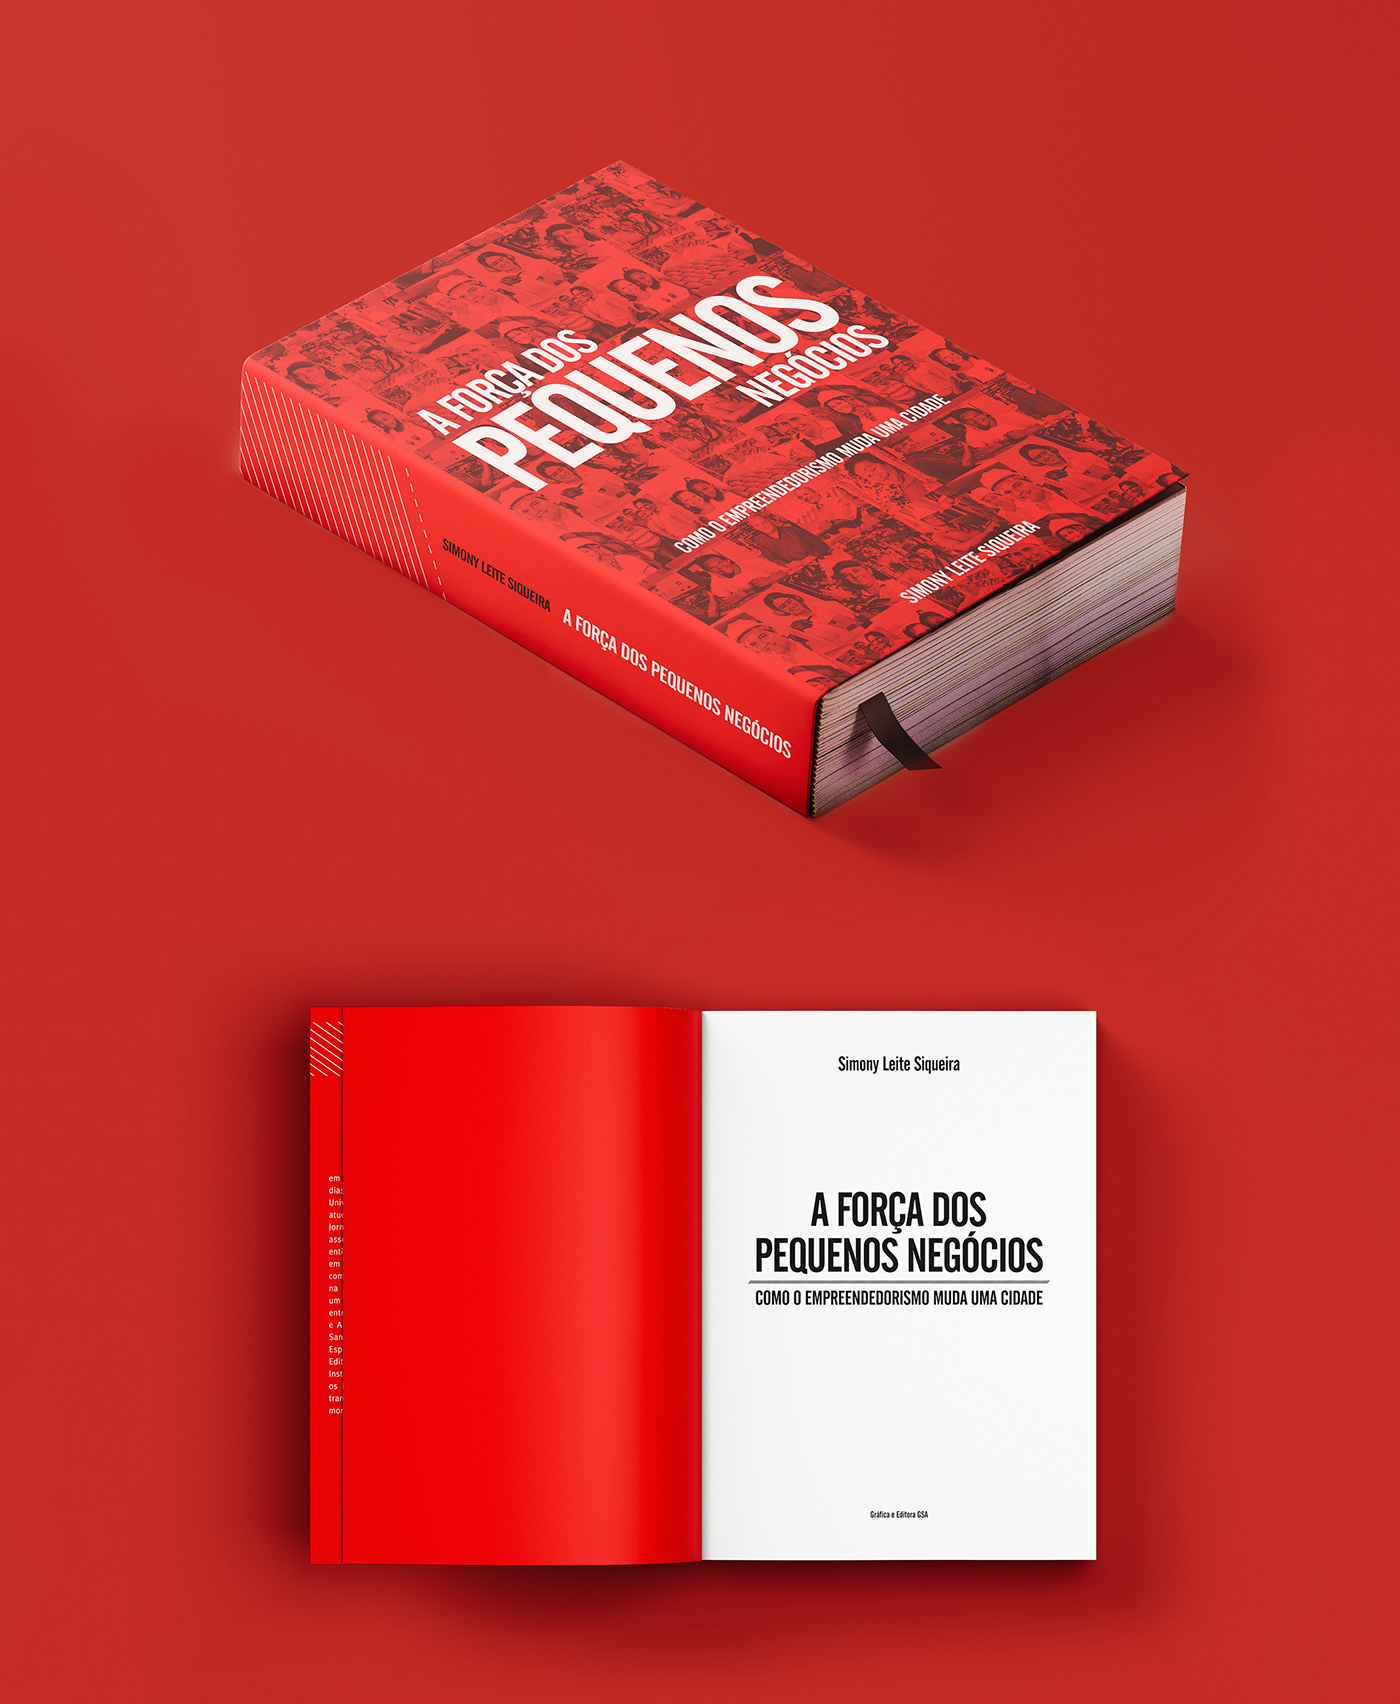 cariacica diagramação empreendedor empreendedorismo MICROEMPRESA Paulo Arrivabene pauloarrivabene pmc red simony leite